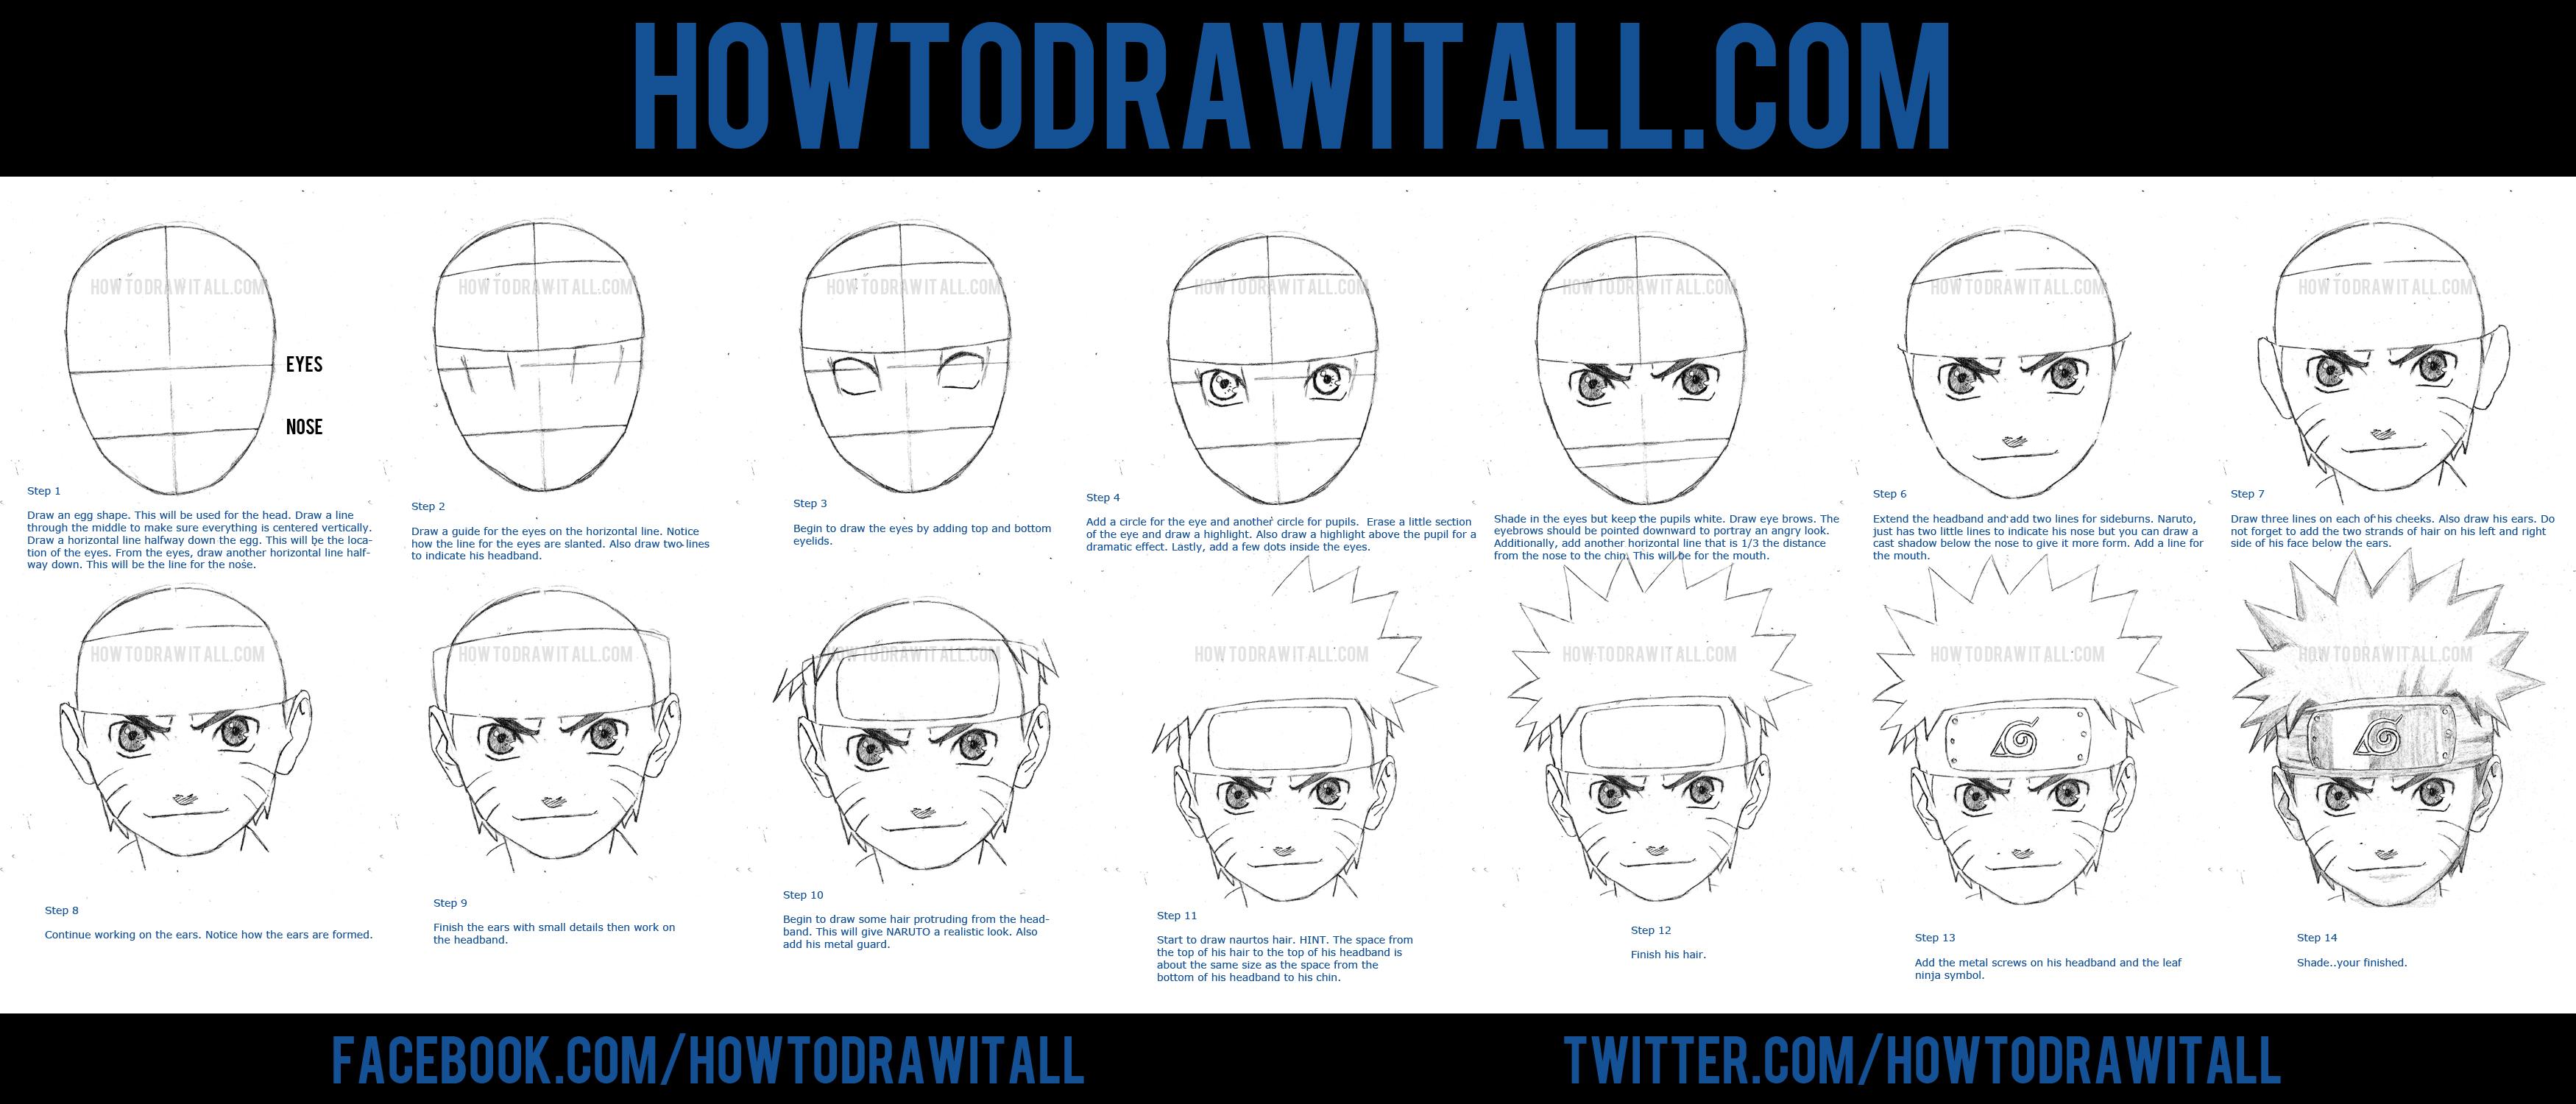 HOW TO DRAW NARUTO UZUMAKI by HowToDrawItAll